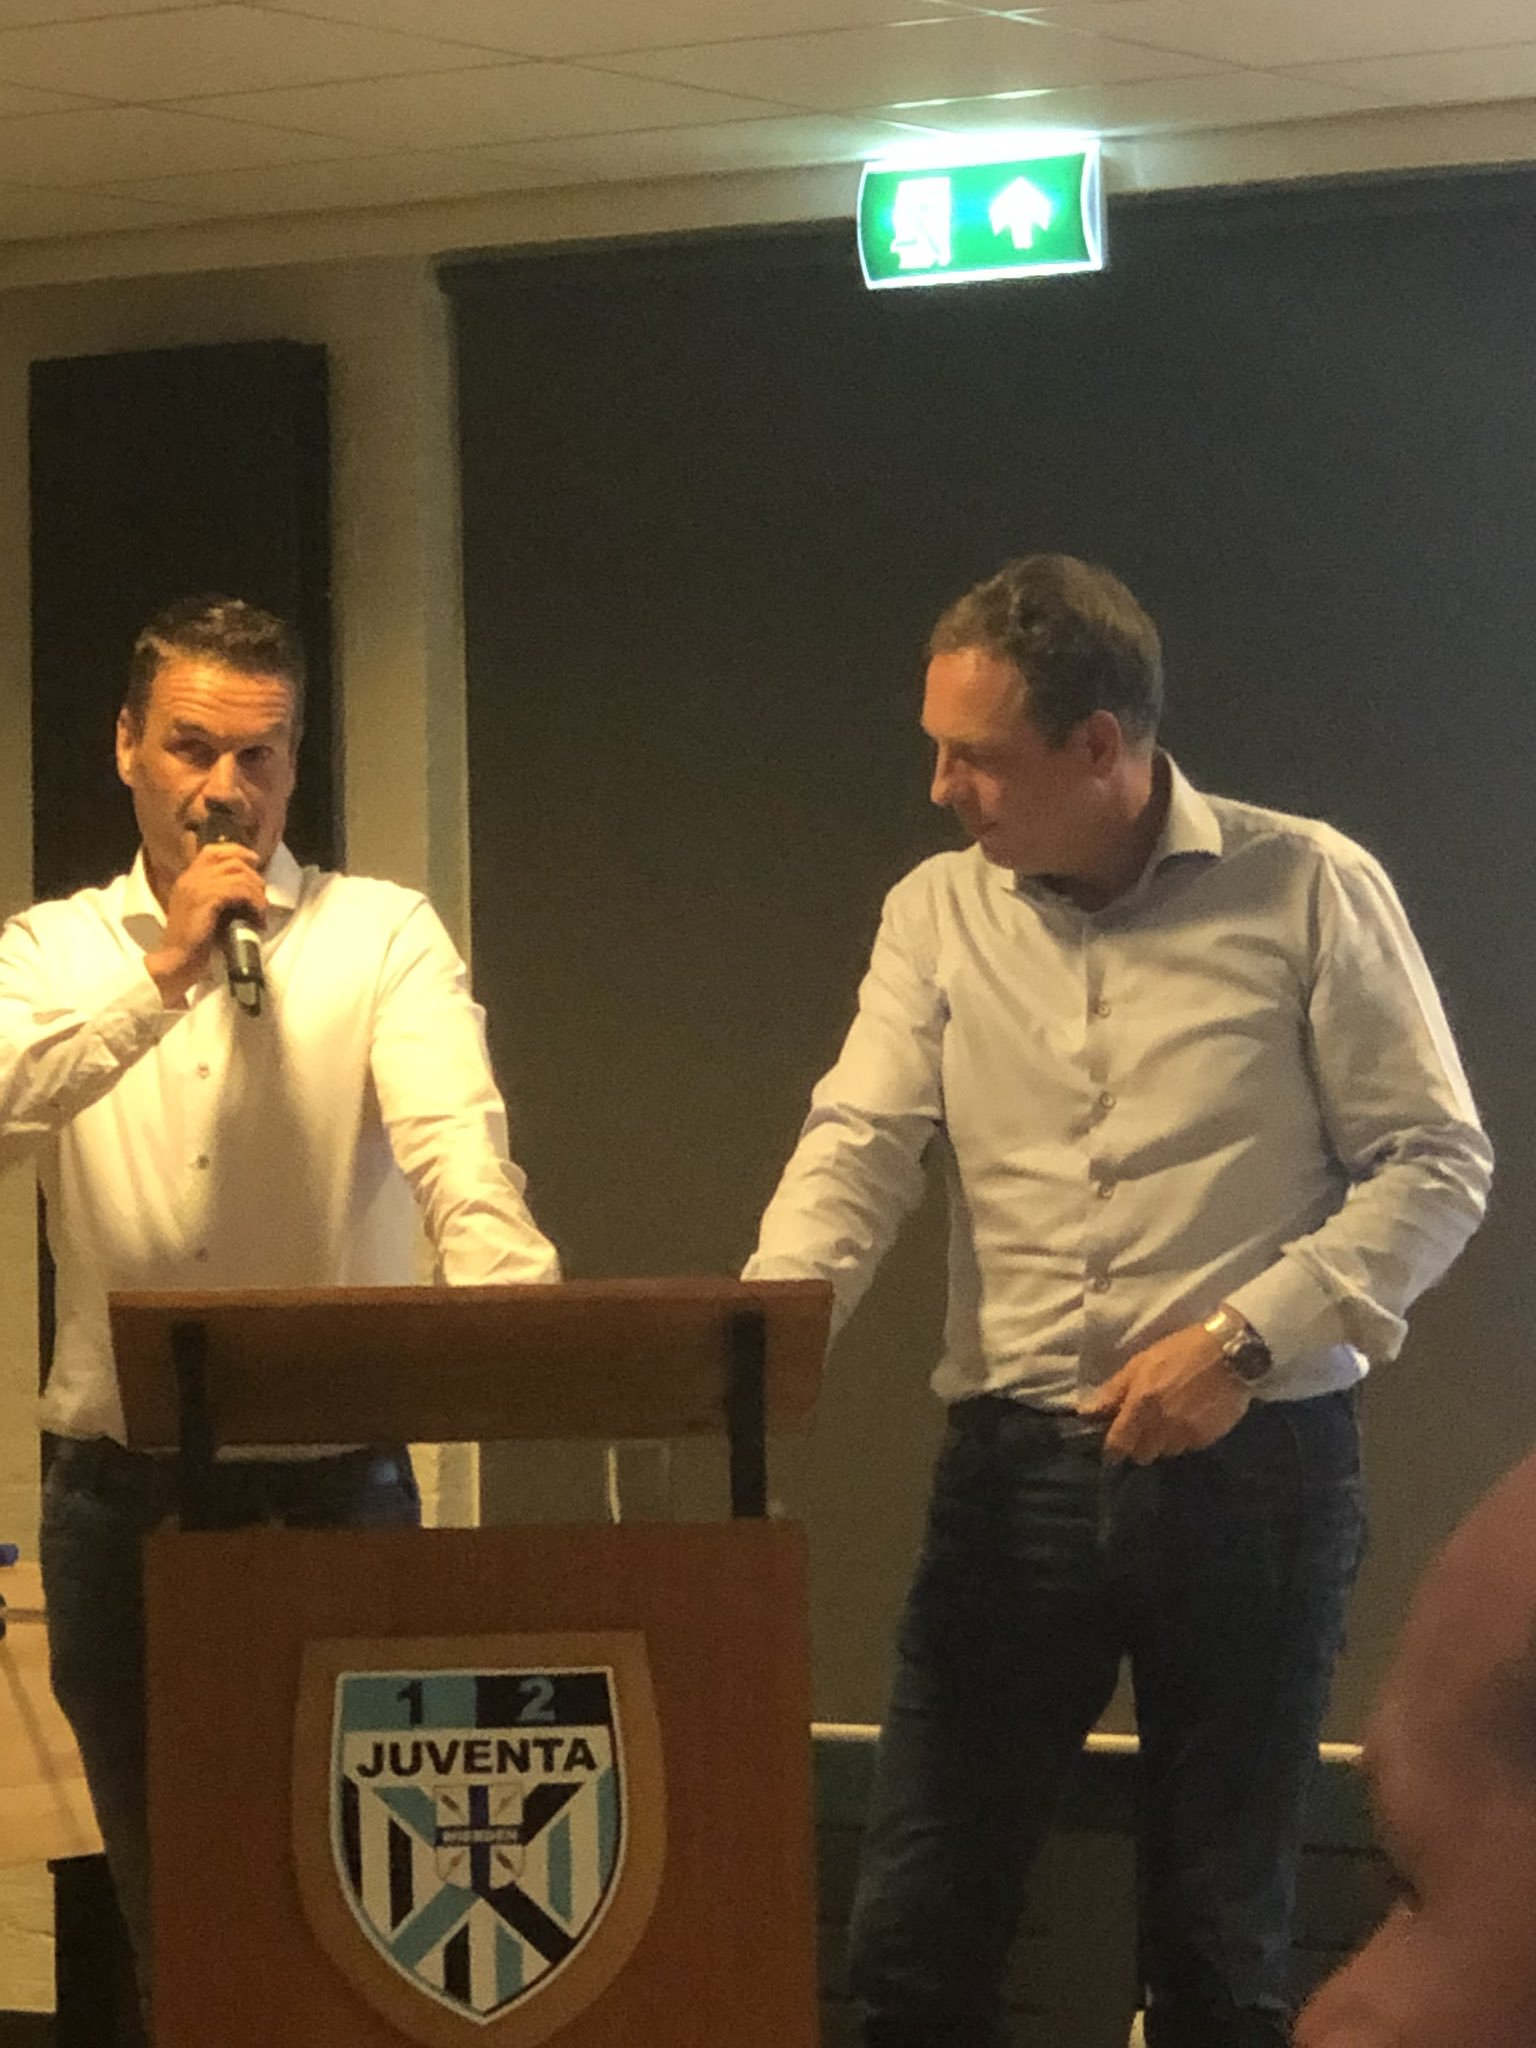 Afscheid Patrick Rikmanspoel en Alfons Nijboer, Welkom Martin Peterink!